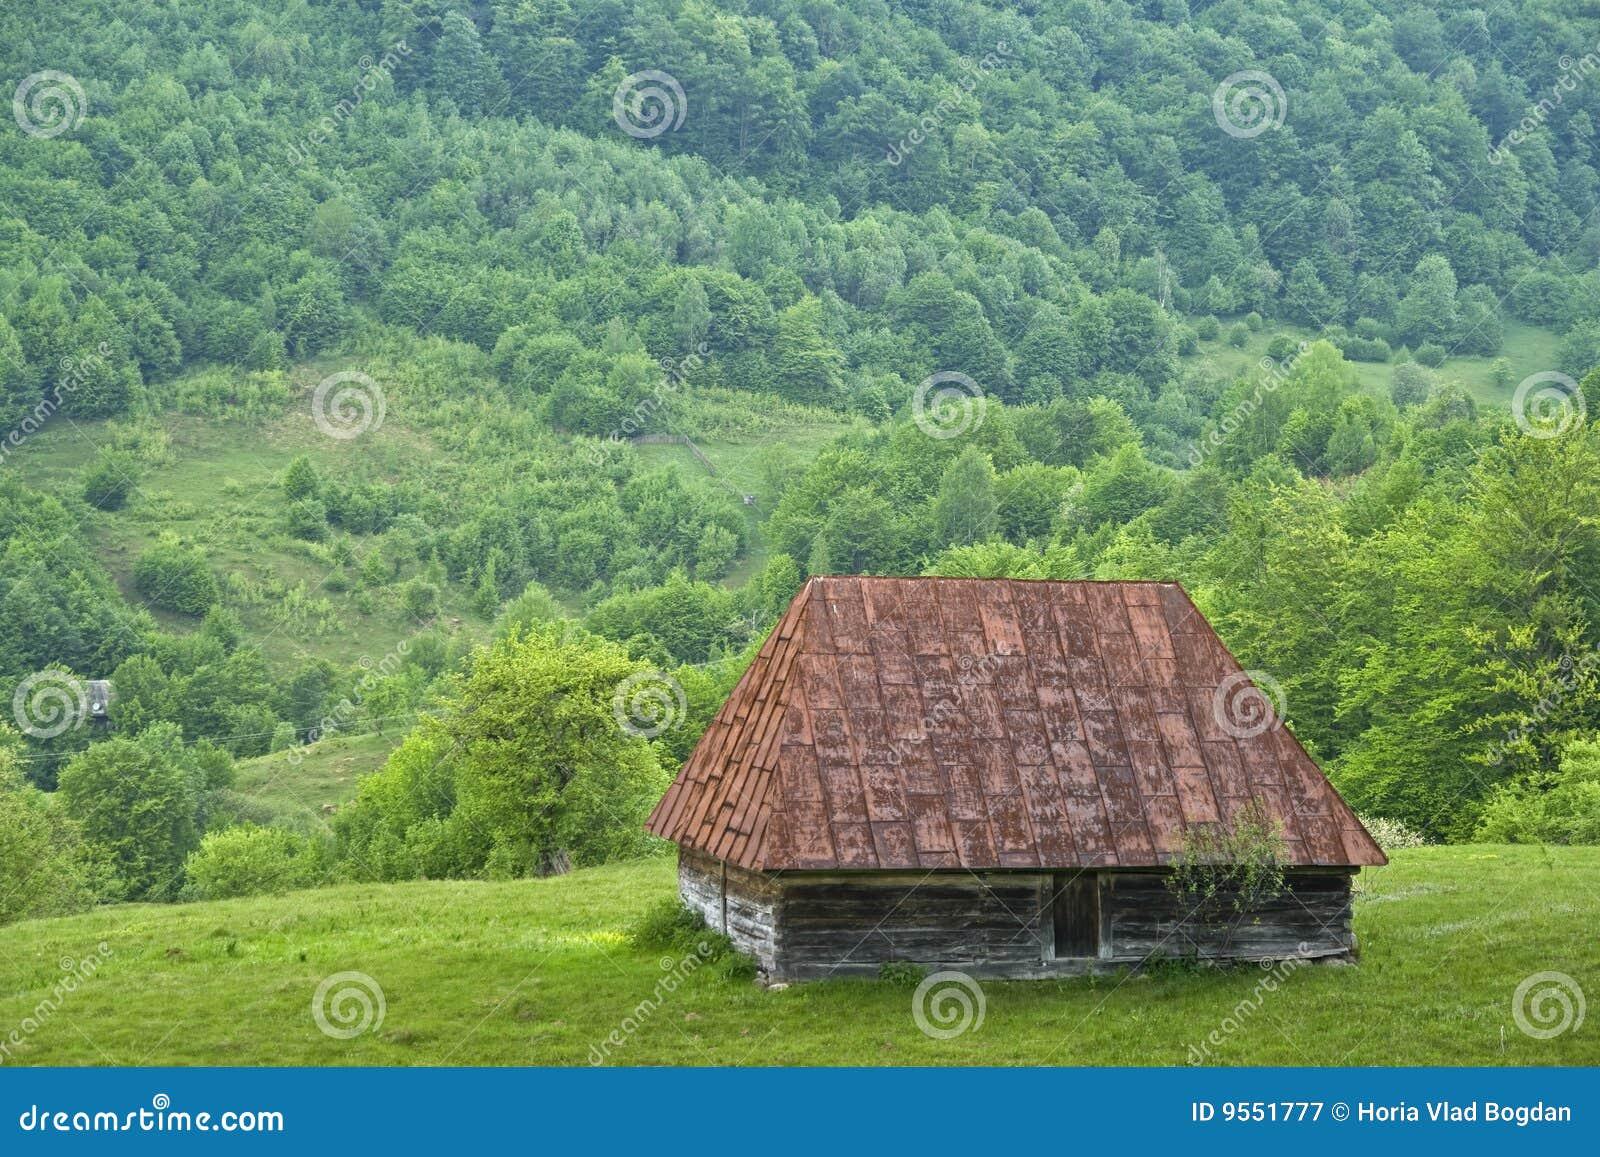 Old mountain countryside house - Romania